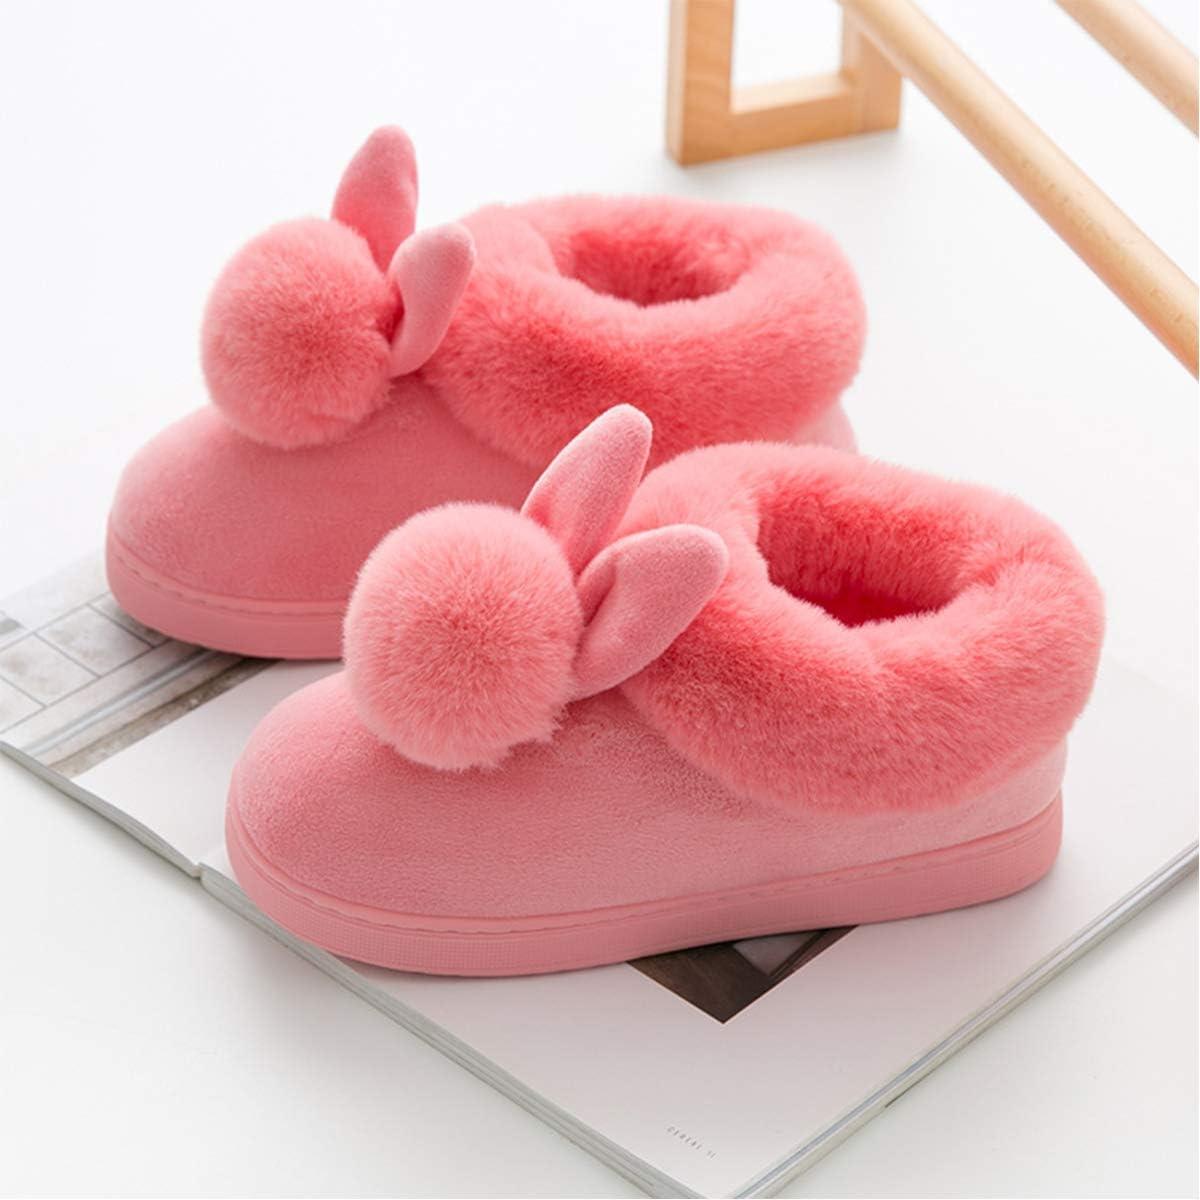 Evaliana Fluffy Faux Fur Cozy Slippers Winter Warm Indoor Shoes Fleece Slip-On Flats